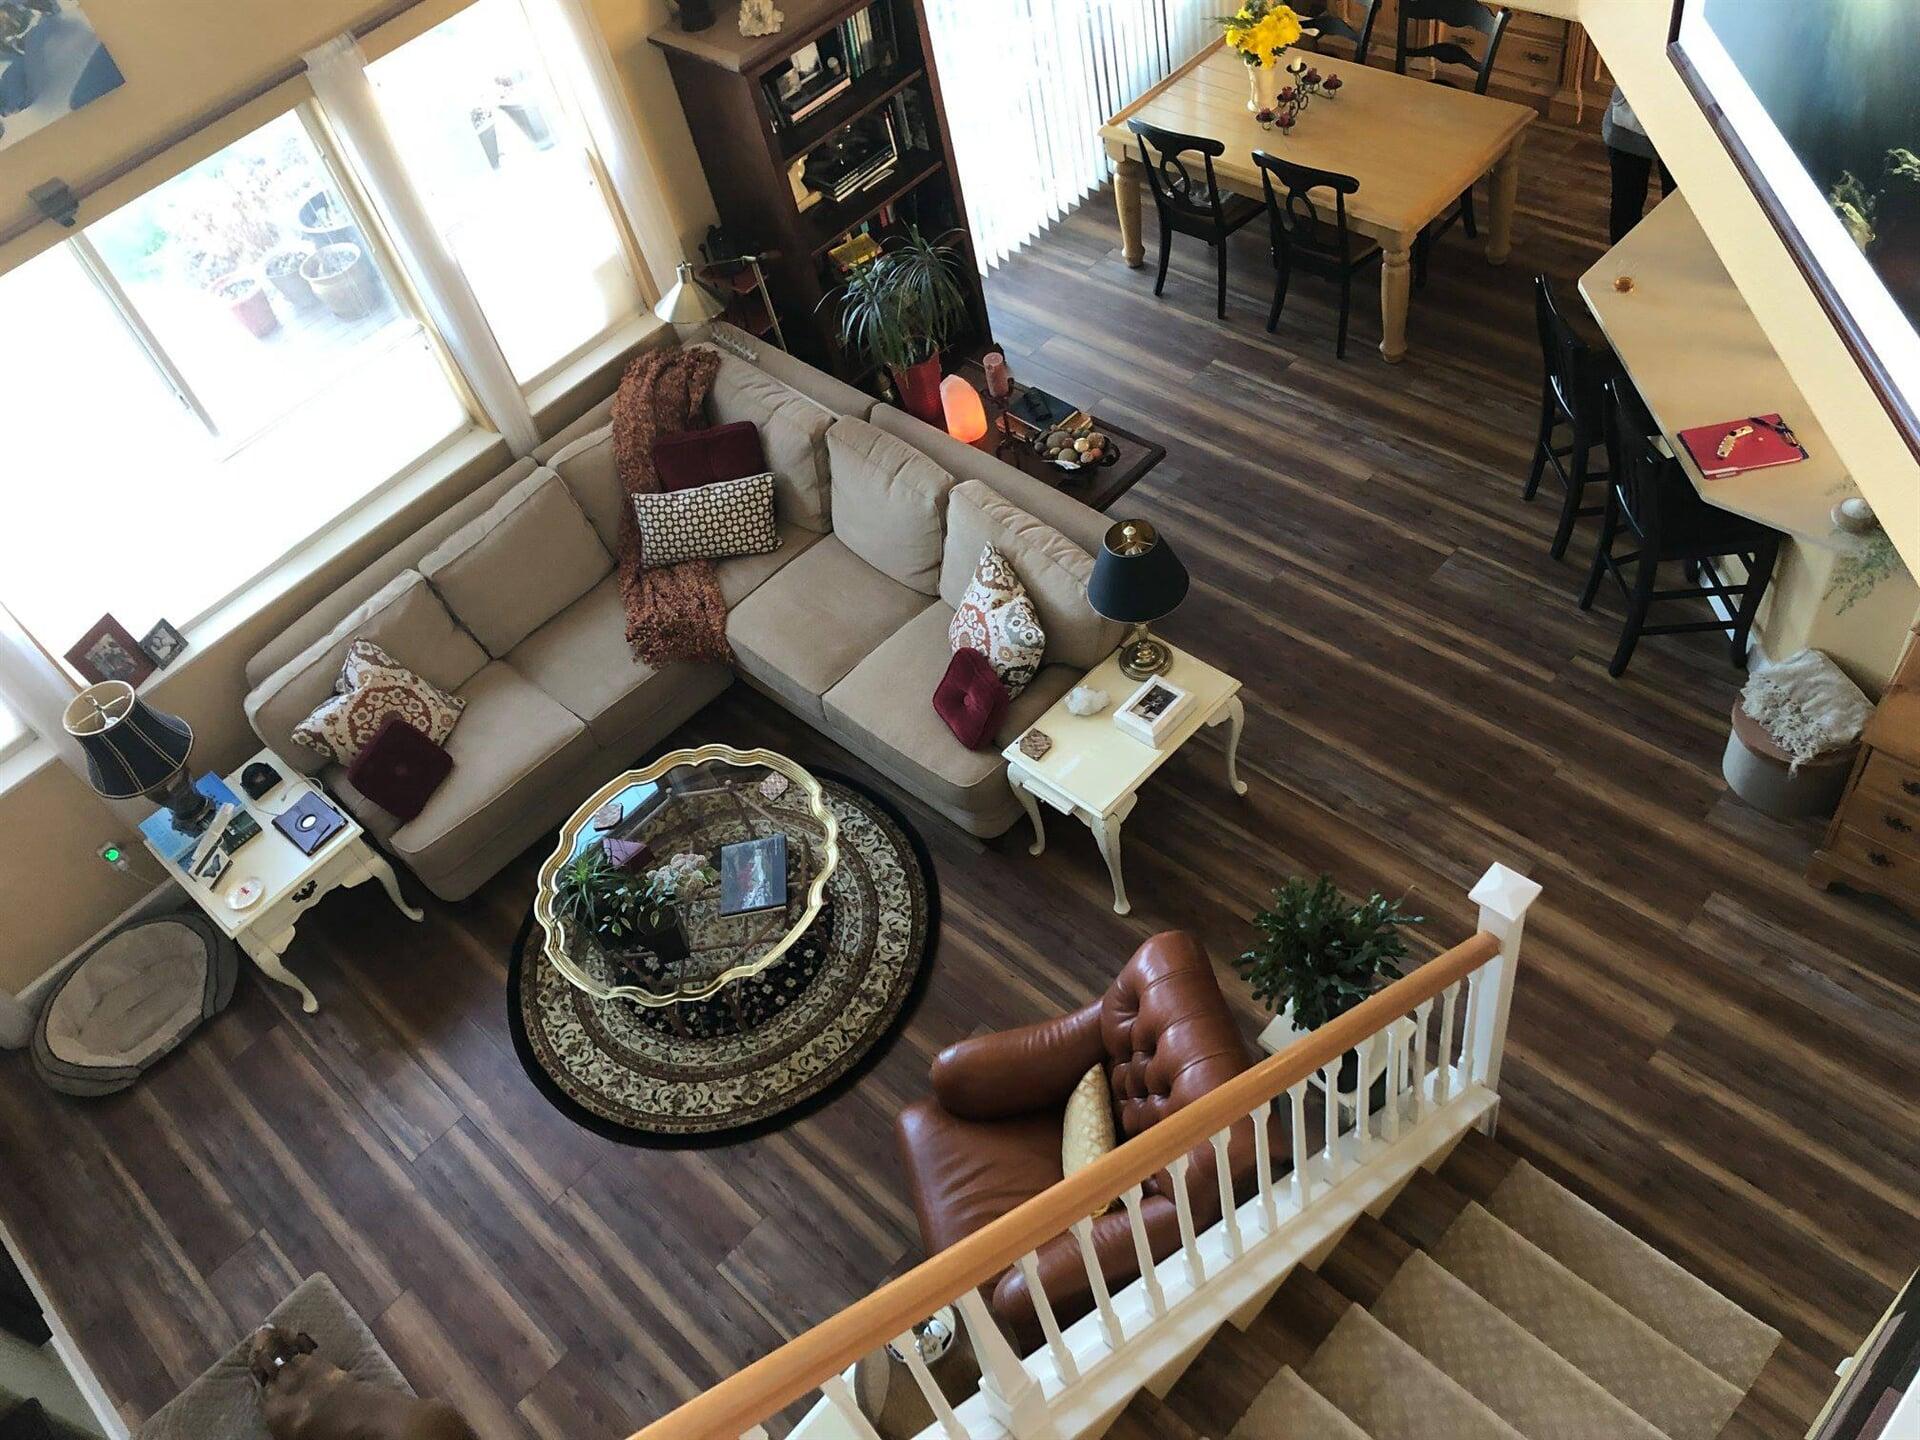 Hardwood flooring from Carpet King Interiors in Fallon, NV